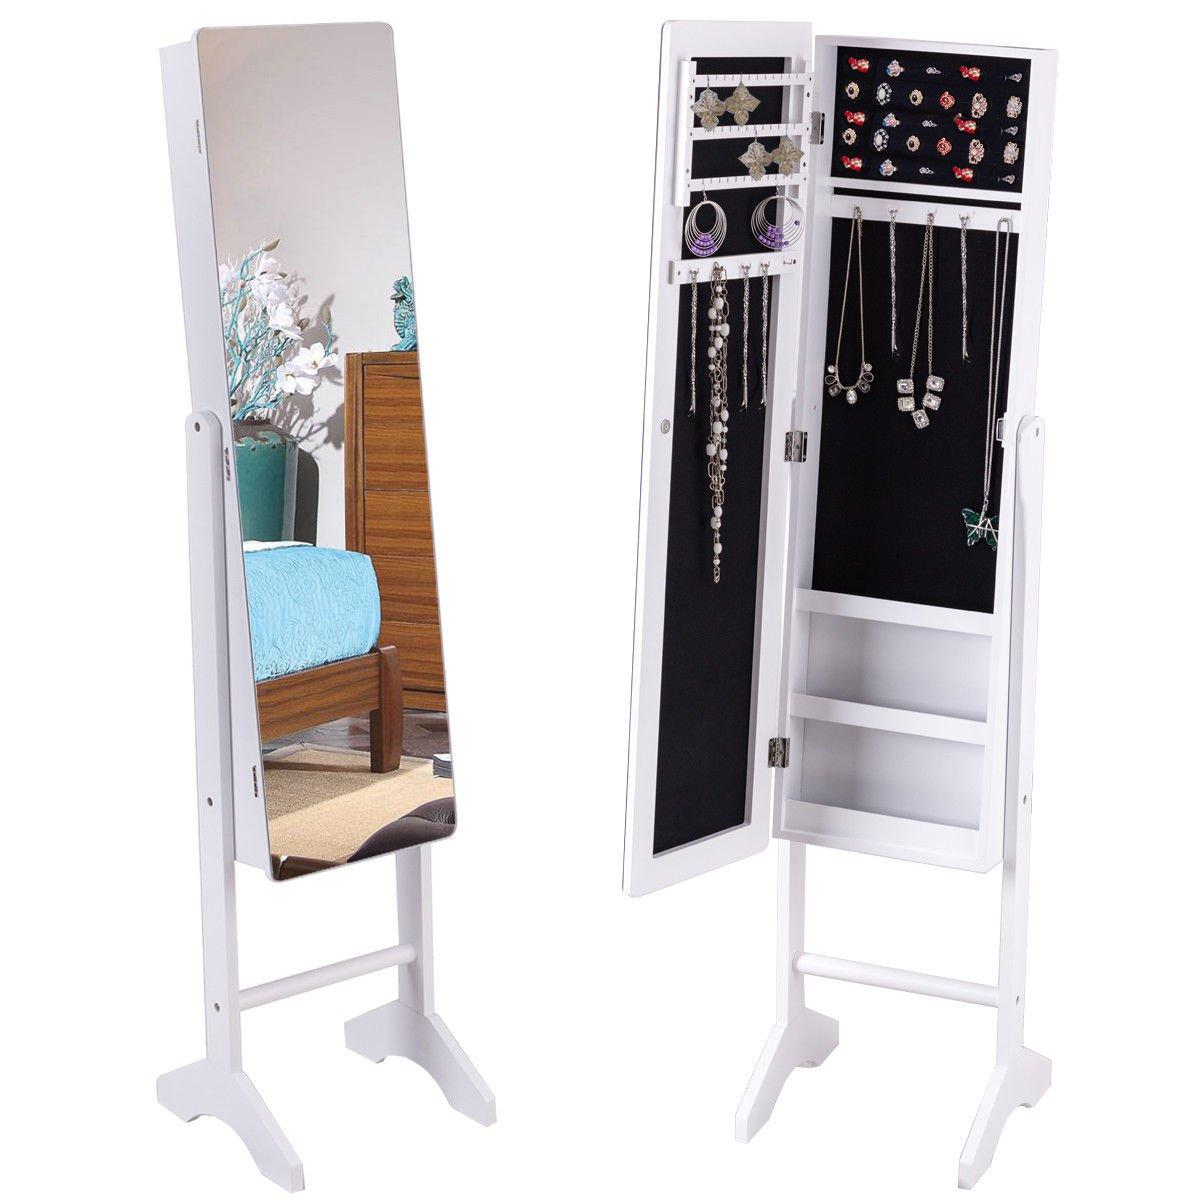 Giantex Free Standing Mirrored Jewelry Cabinet Armoire Lockable Storage Organizer Mirror Rings White